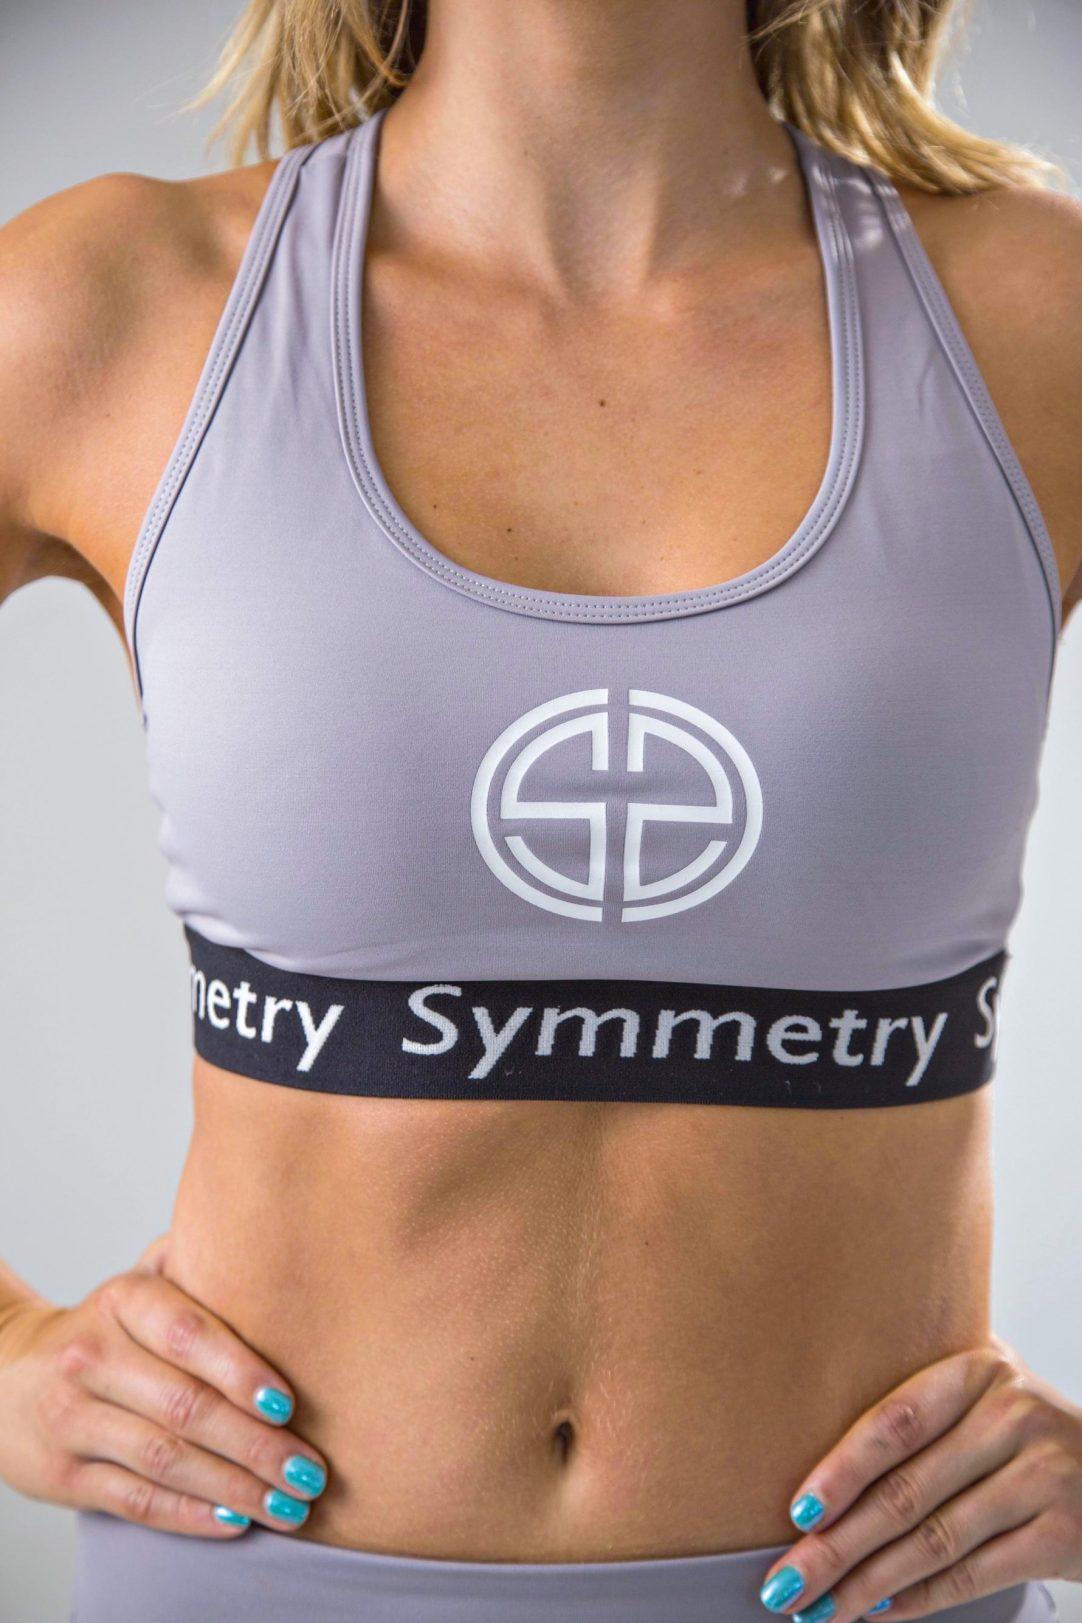 womens sports bra in grey and black | symmetry athletics